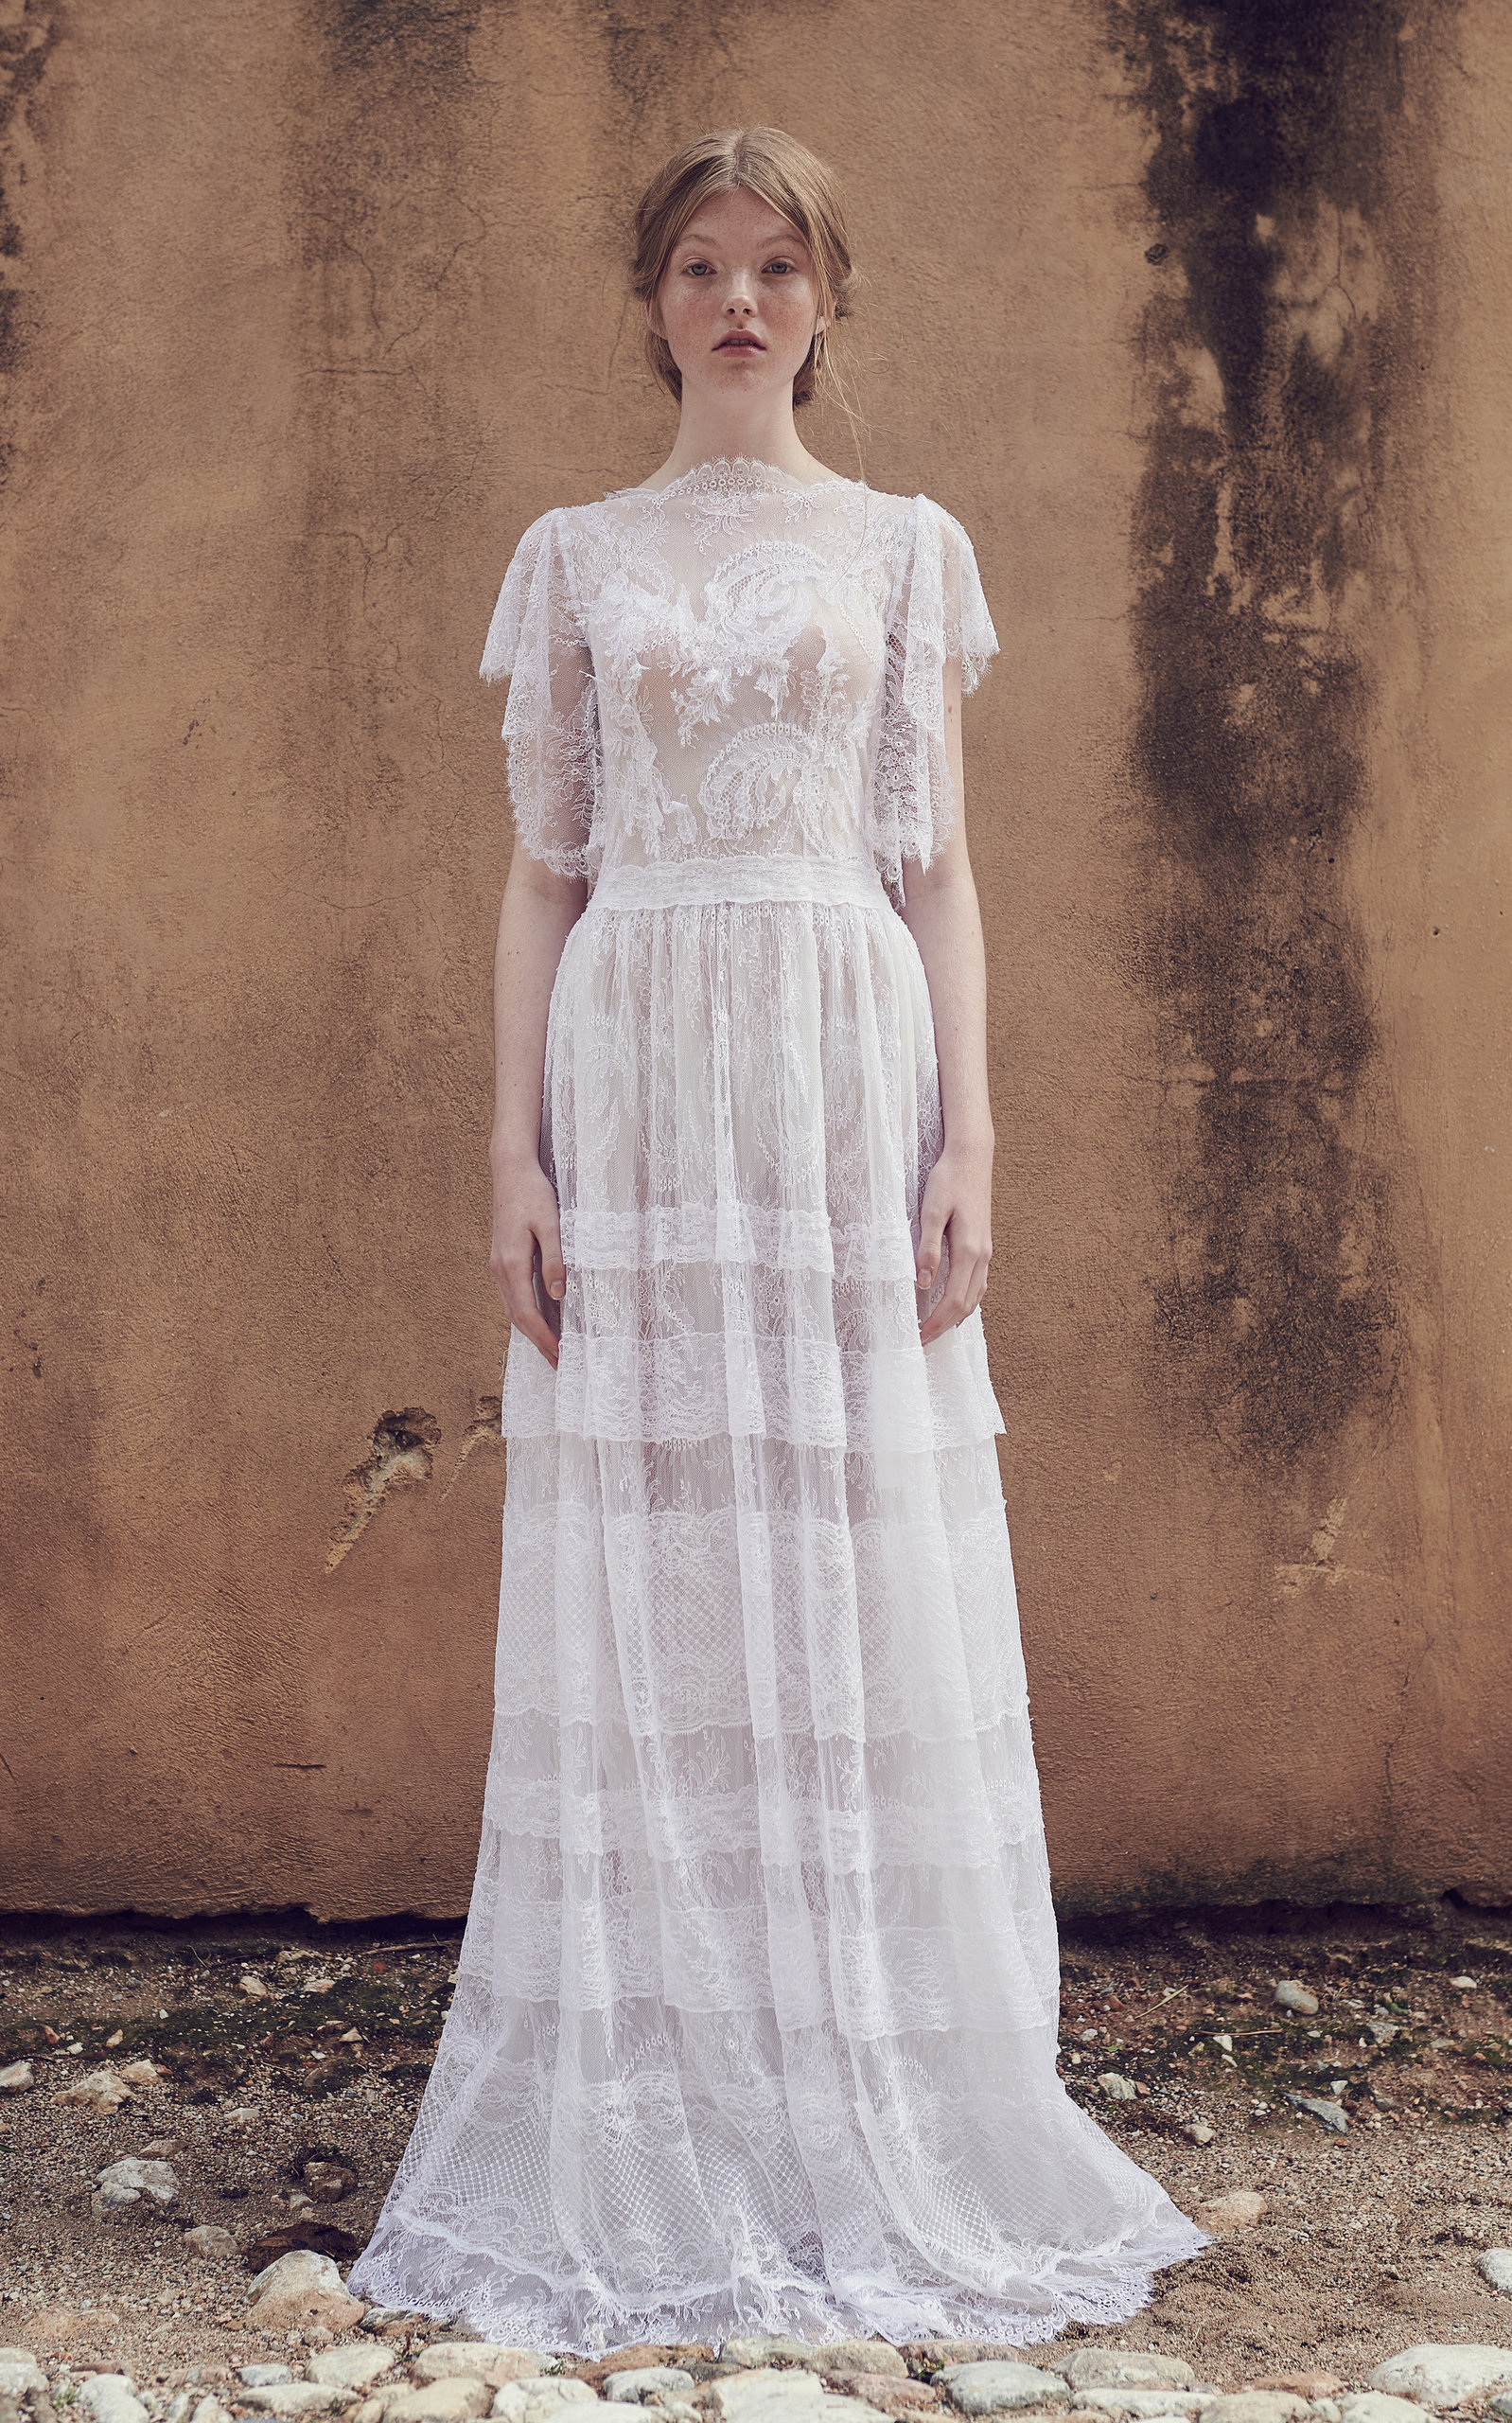 COSTARELLOS BRIDAL Neoromantic Angel Sleeve Tiered Tulle Dress in White